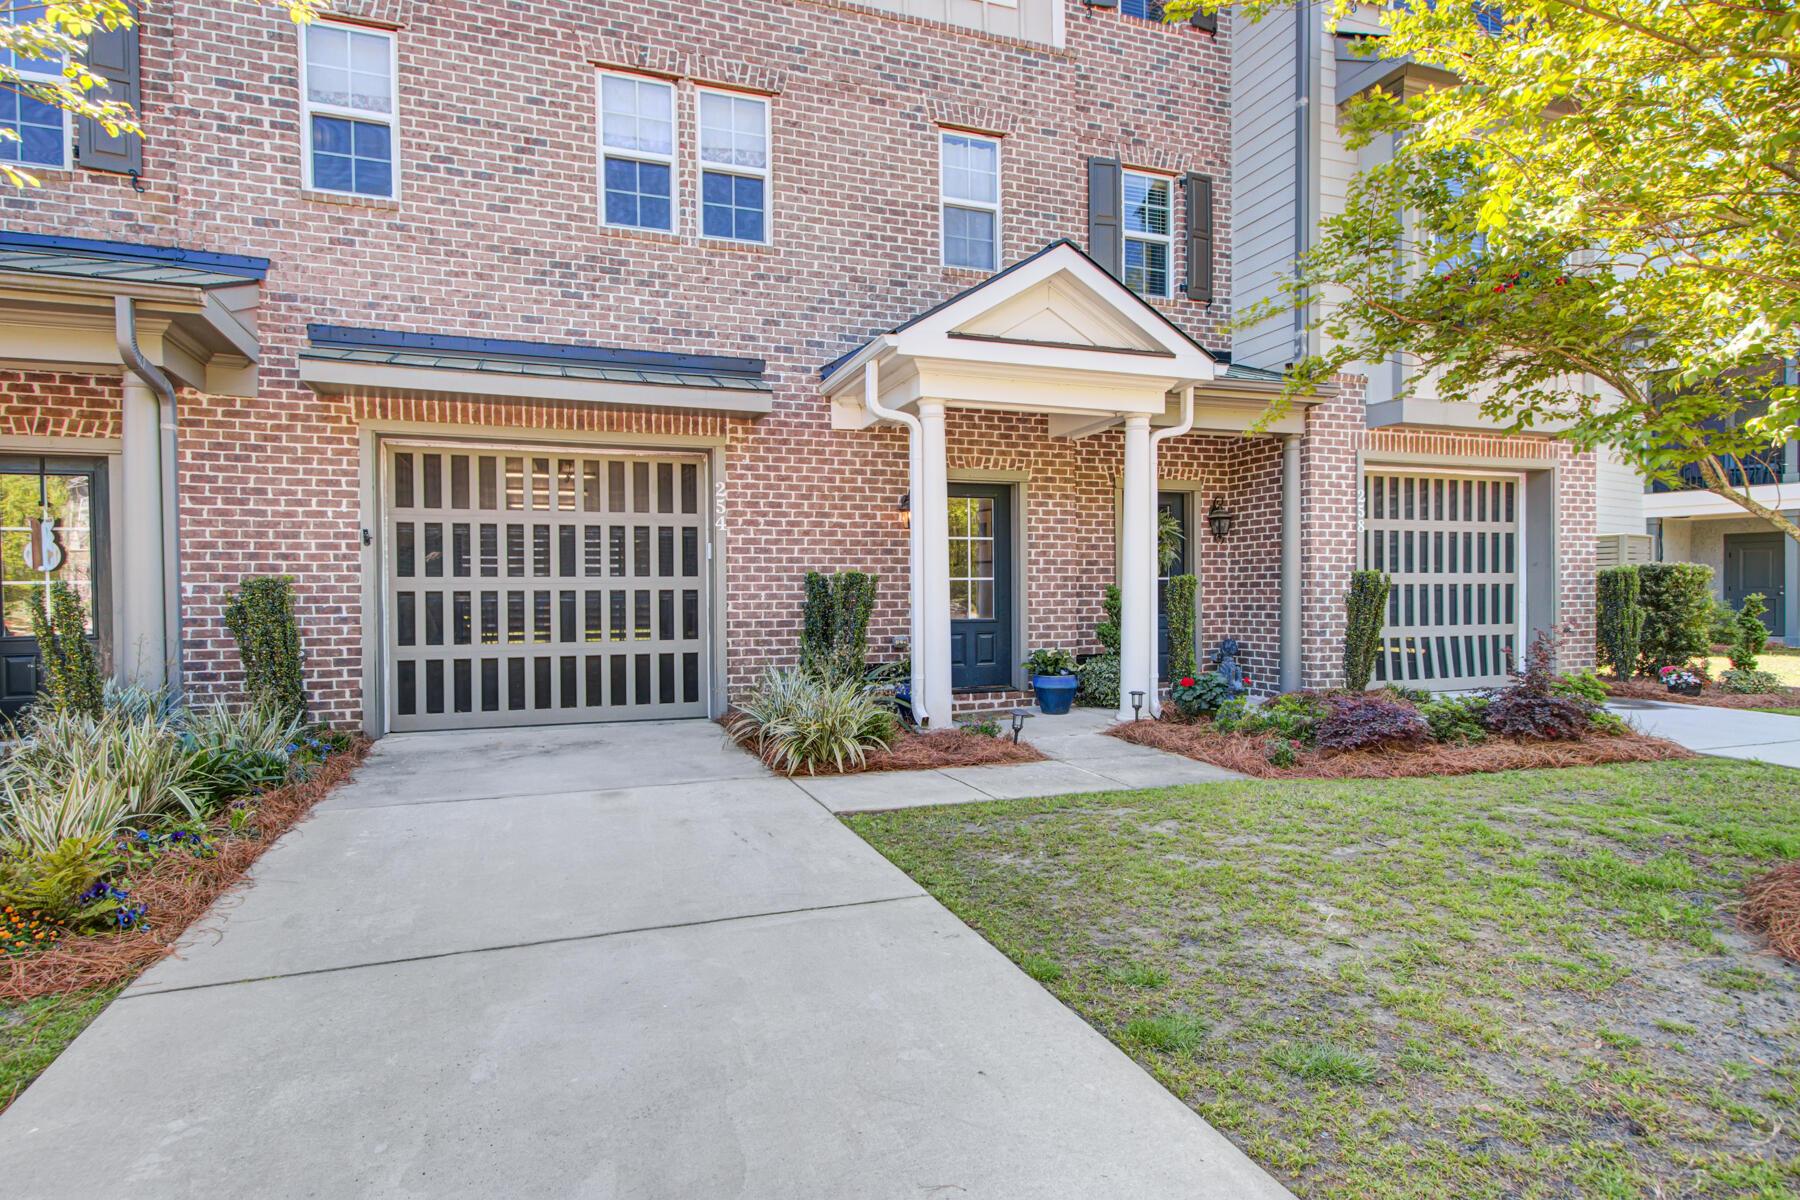 Etiwan Pointe Homes For Sale - 254 Slipper Shell, Mount Pleasant, SC - 43